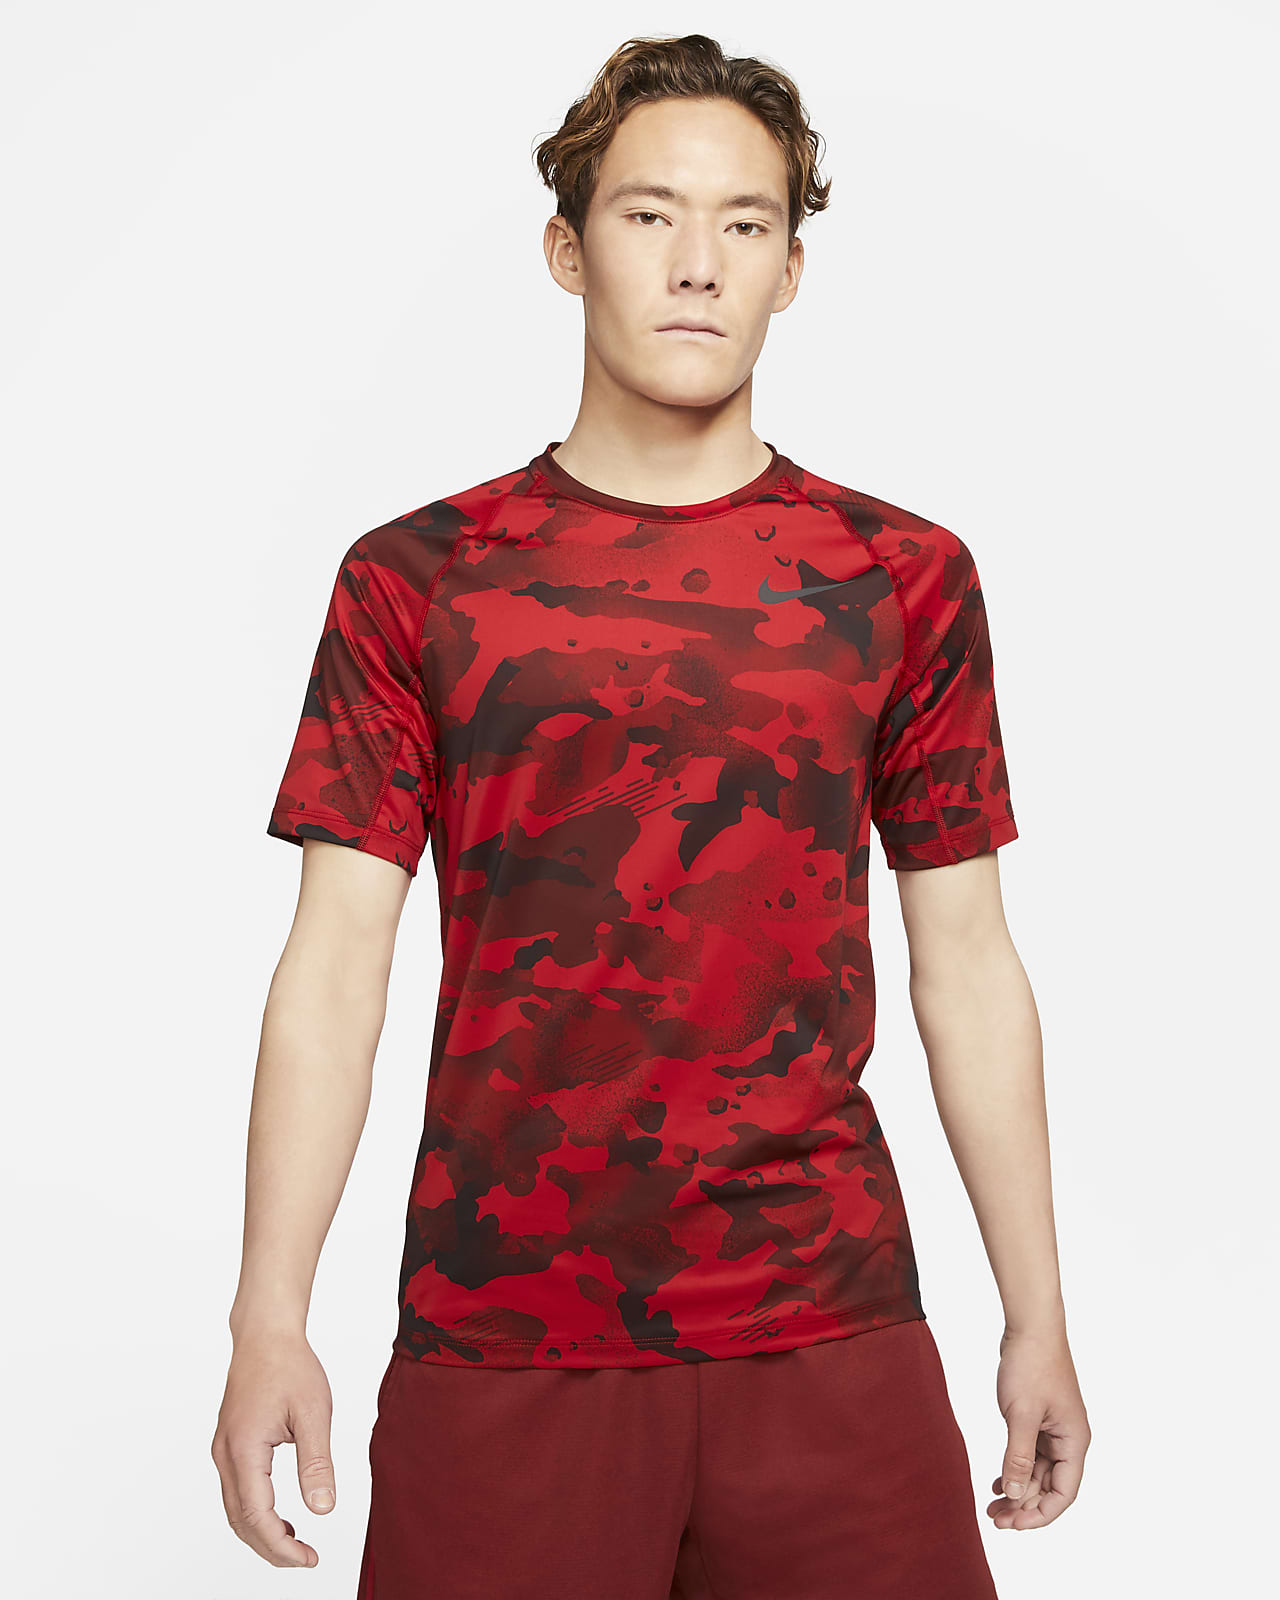 Prenda superior de manga corta para hombre Nike Pro Camo